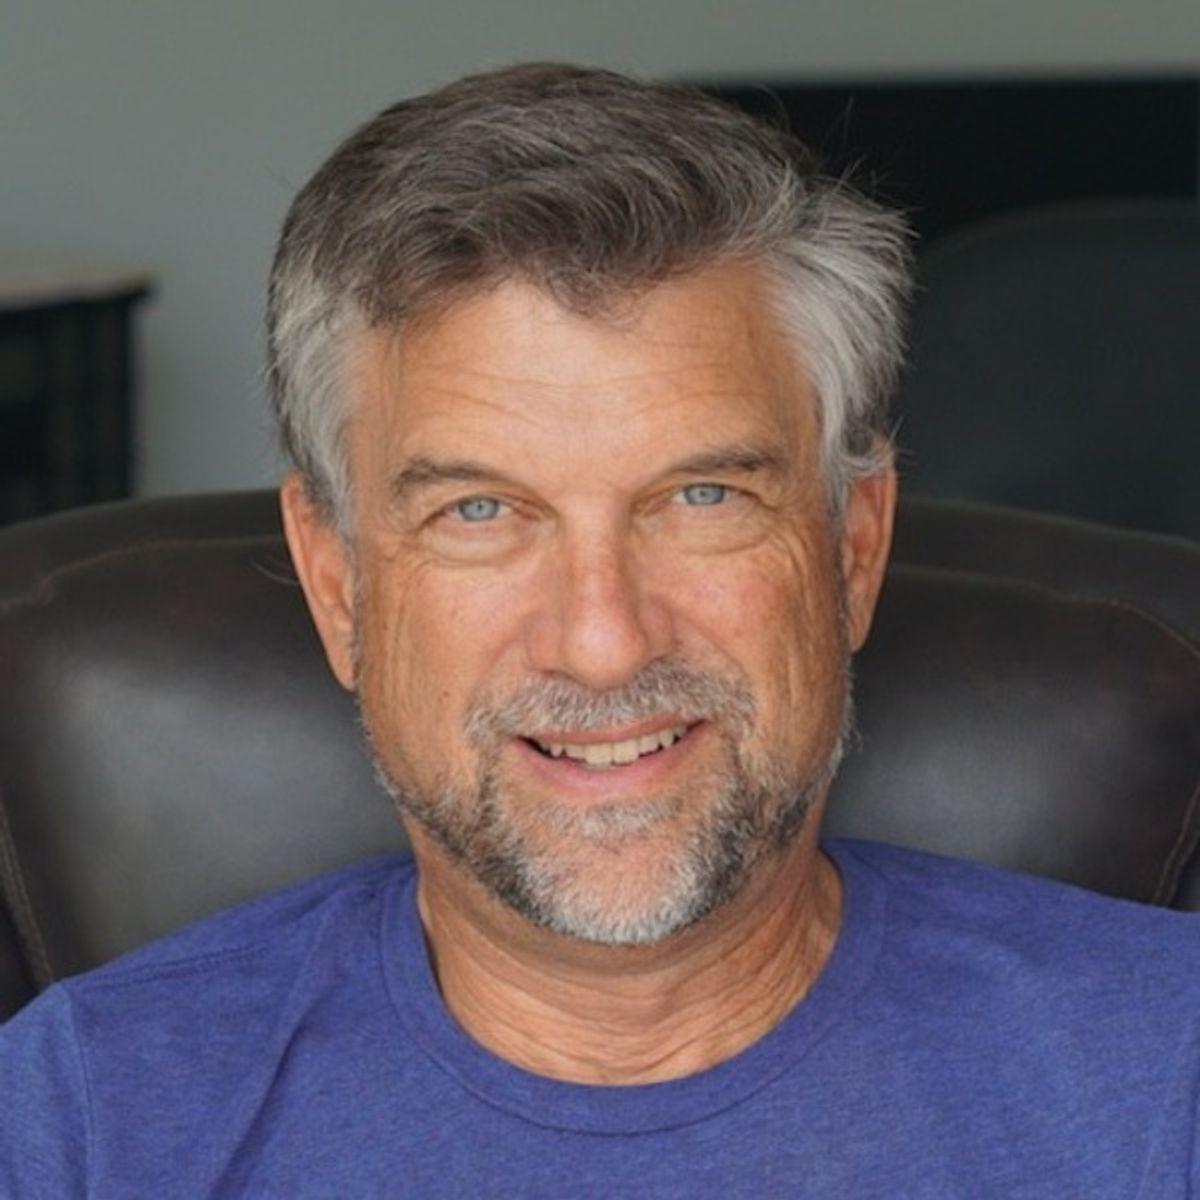 Photo of Jim Horowitz, Managing Partner at Beresford Ventures